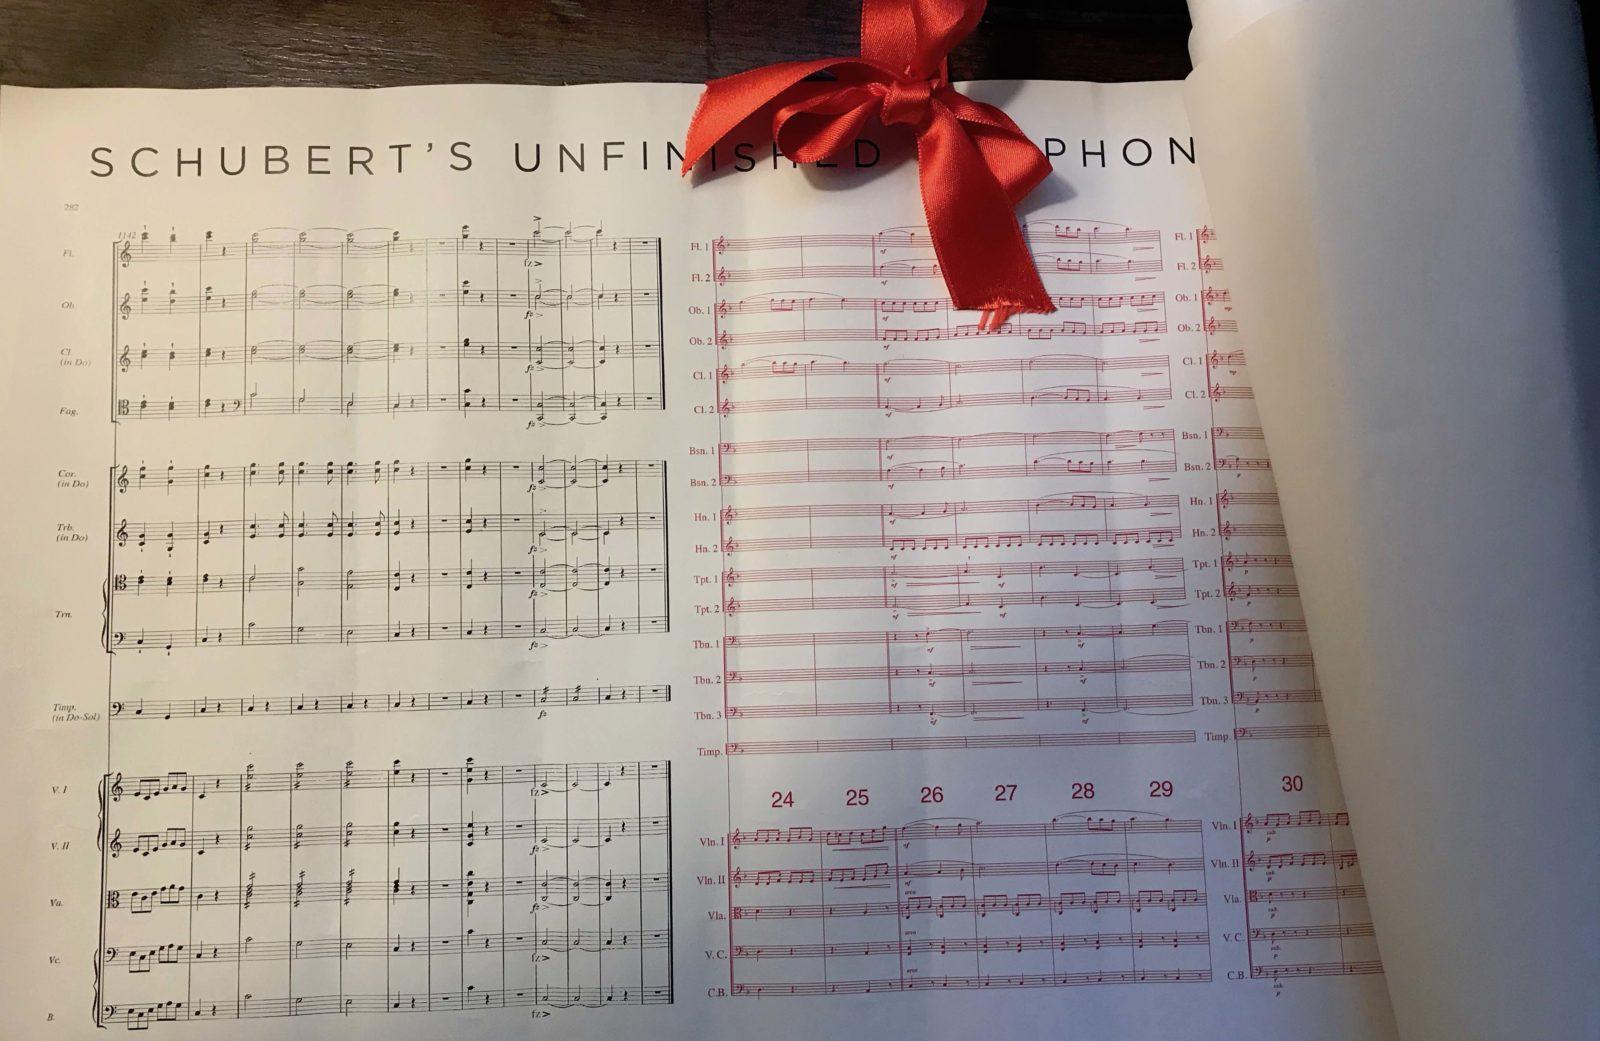 Partition Franz Schubert 8ème symphonie by Huawei